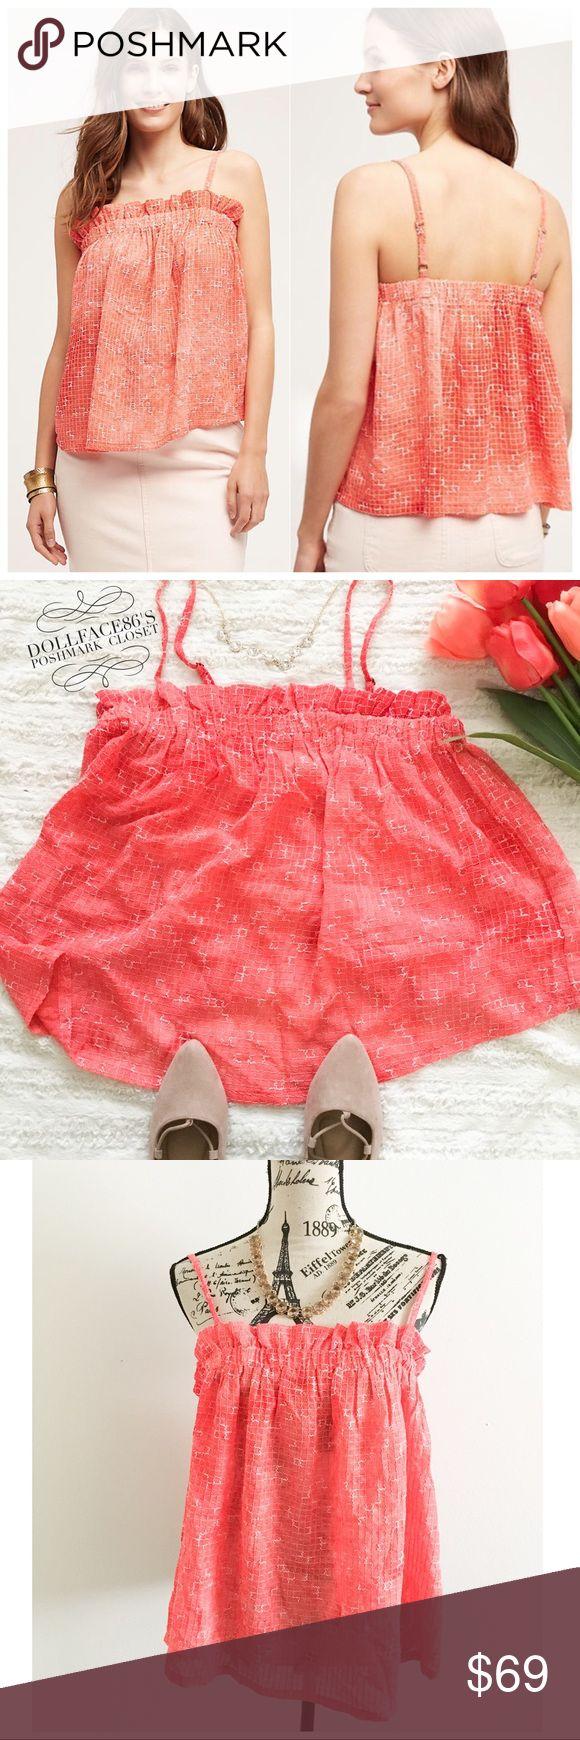 Selling this Anthropologie Pink Ruffle Tank on Poshmark! My username is: dollface86. #shopmycloset #poshmark #fashion #shopping #style #forsale #Anthropologie #Tops